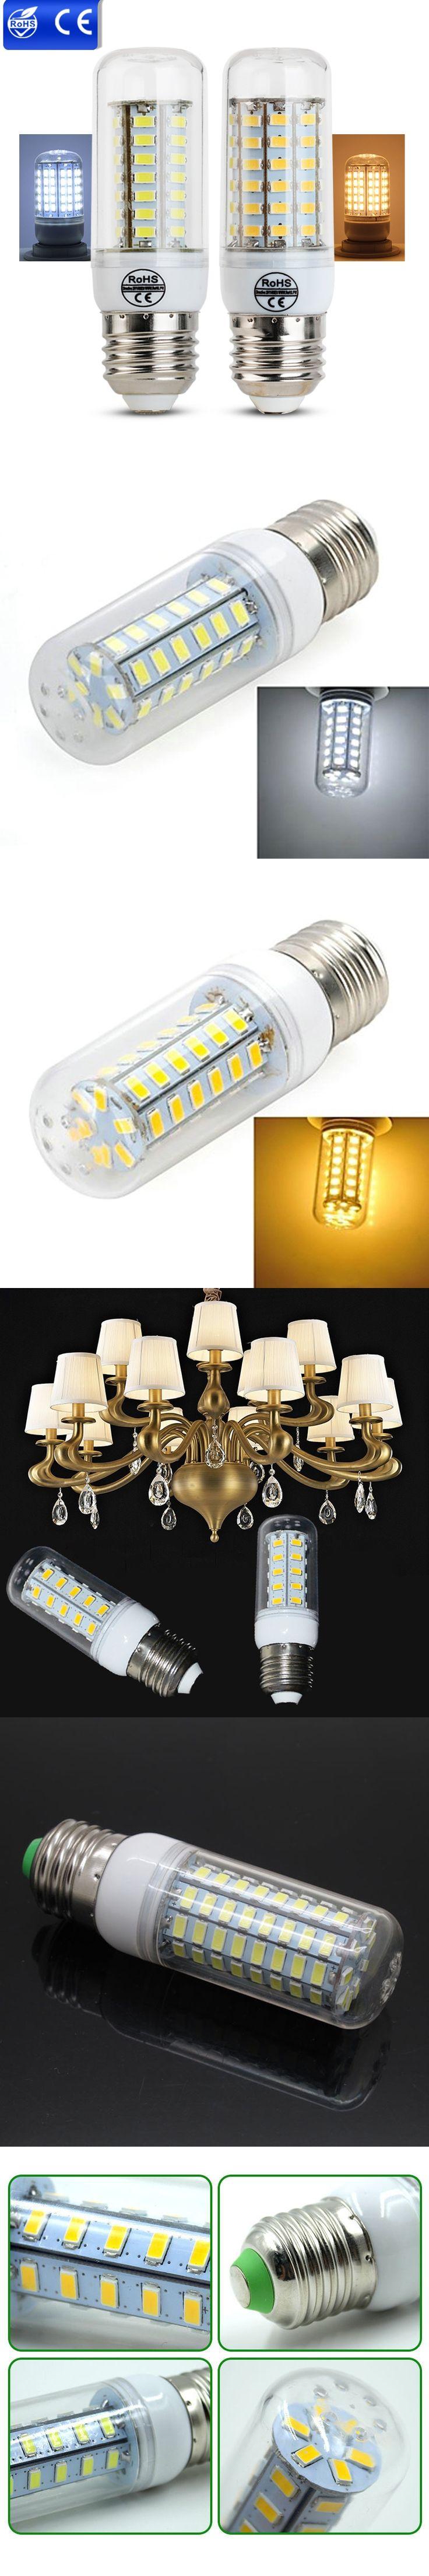 Ampolleta Led 220V E27 LED Bulb Lamp 24LEDs 36LEDs 48LEDs 56LEDs 69 LED SMD 5730 Lampadine Led E14 Lights For Home Decoration